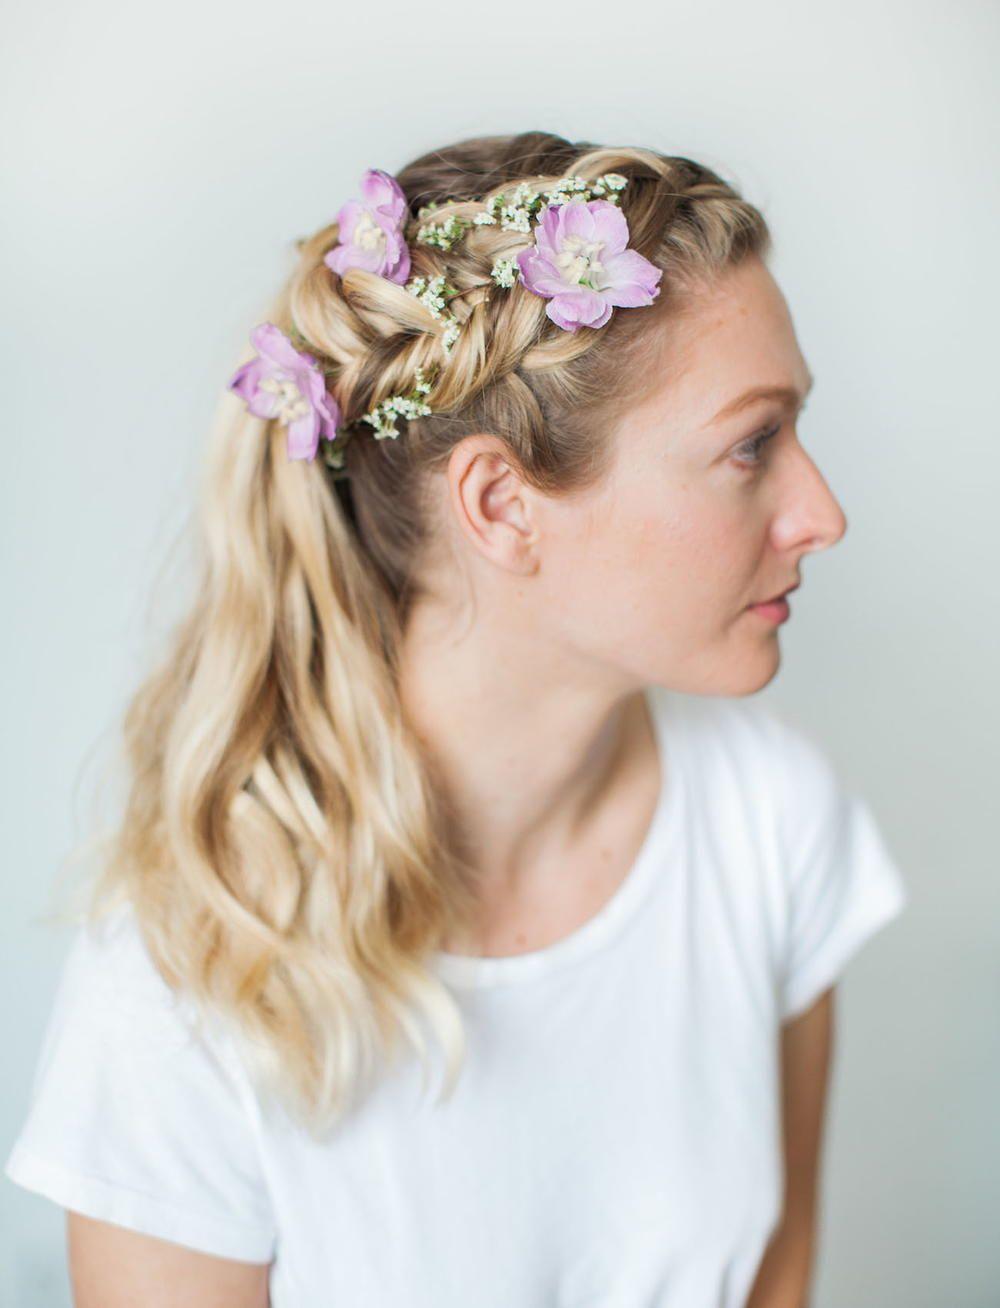 Flower princess wedding hair princess beautiful hairstyles and flower princess wedding hair izmirmasajfo Gallery